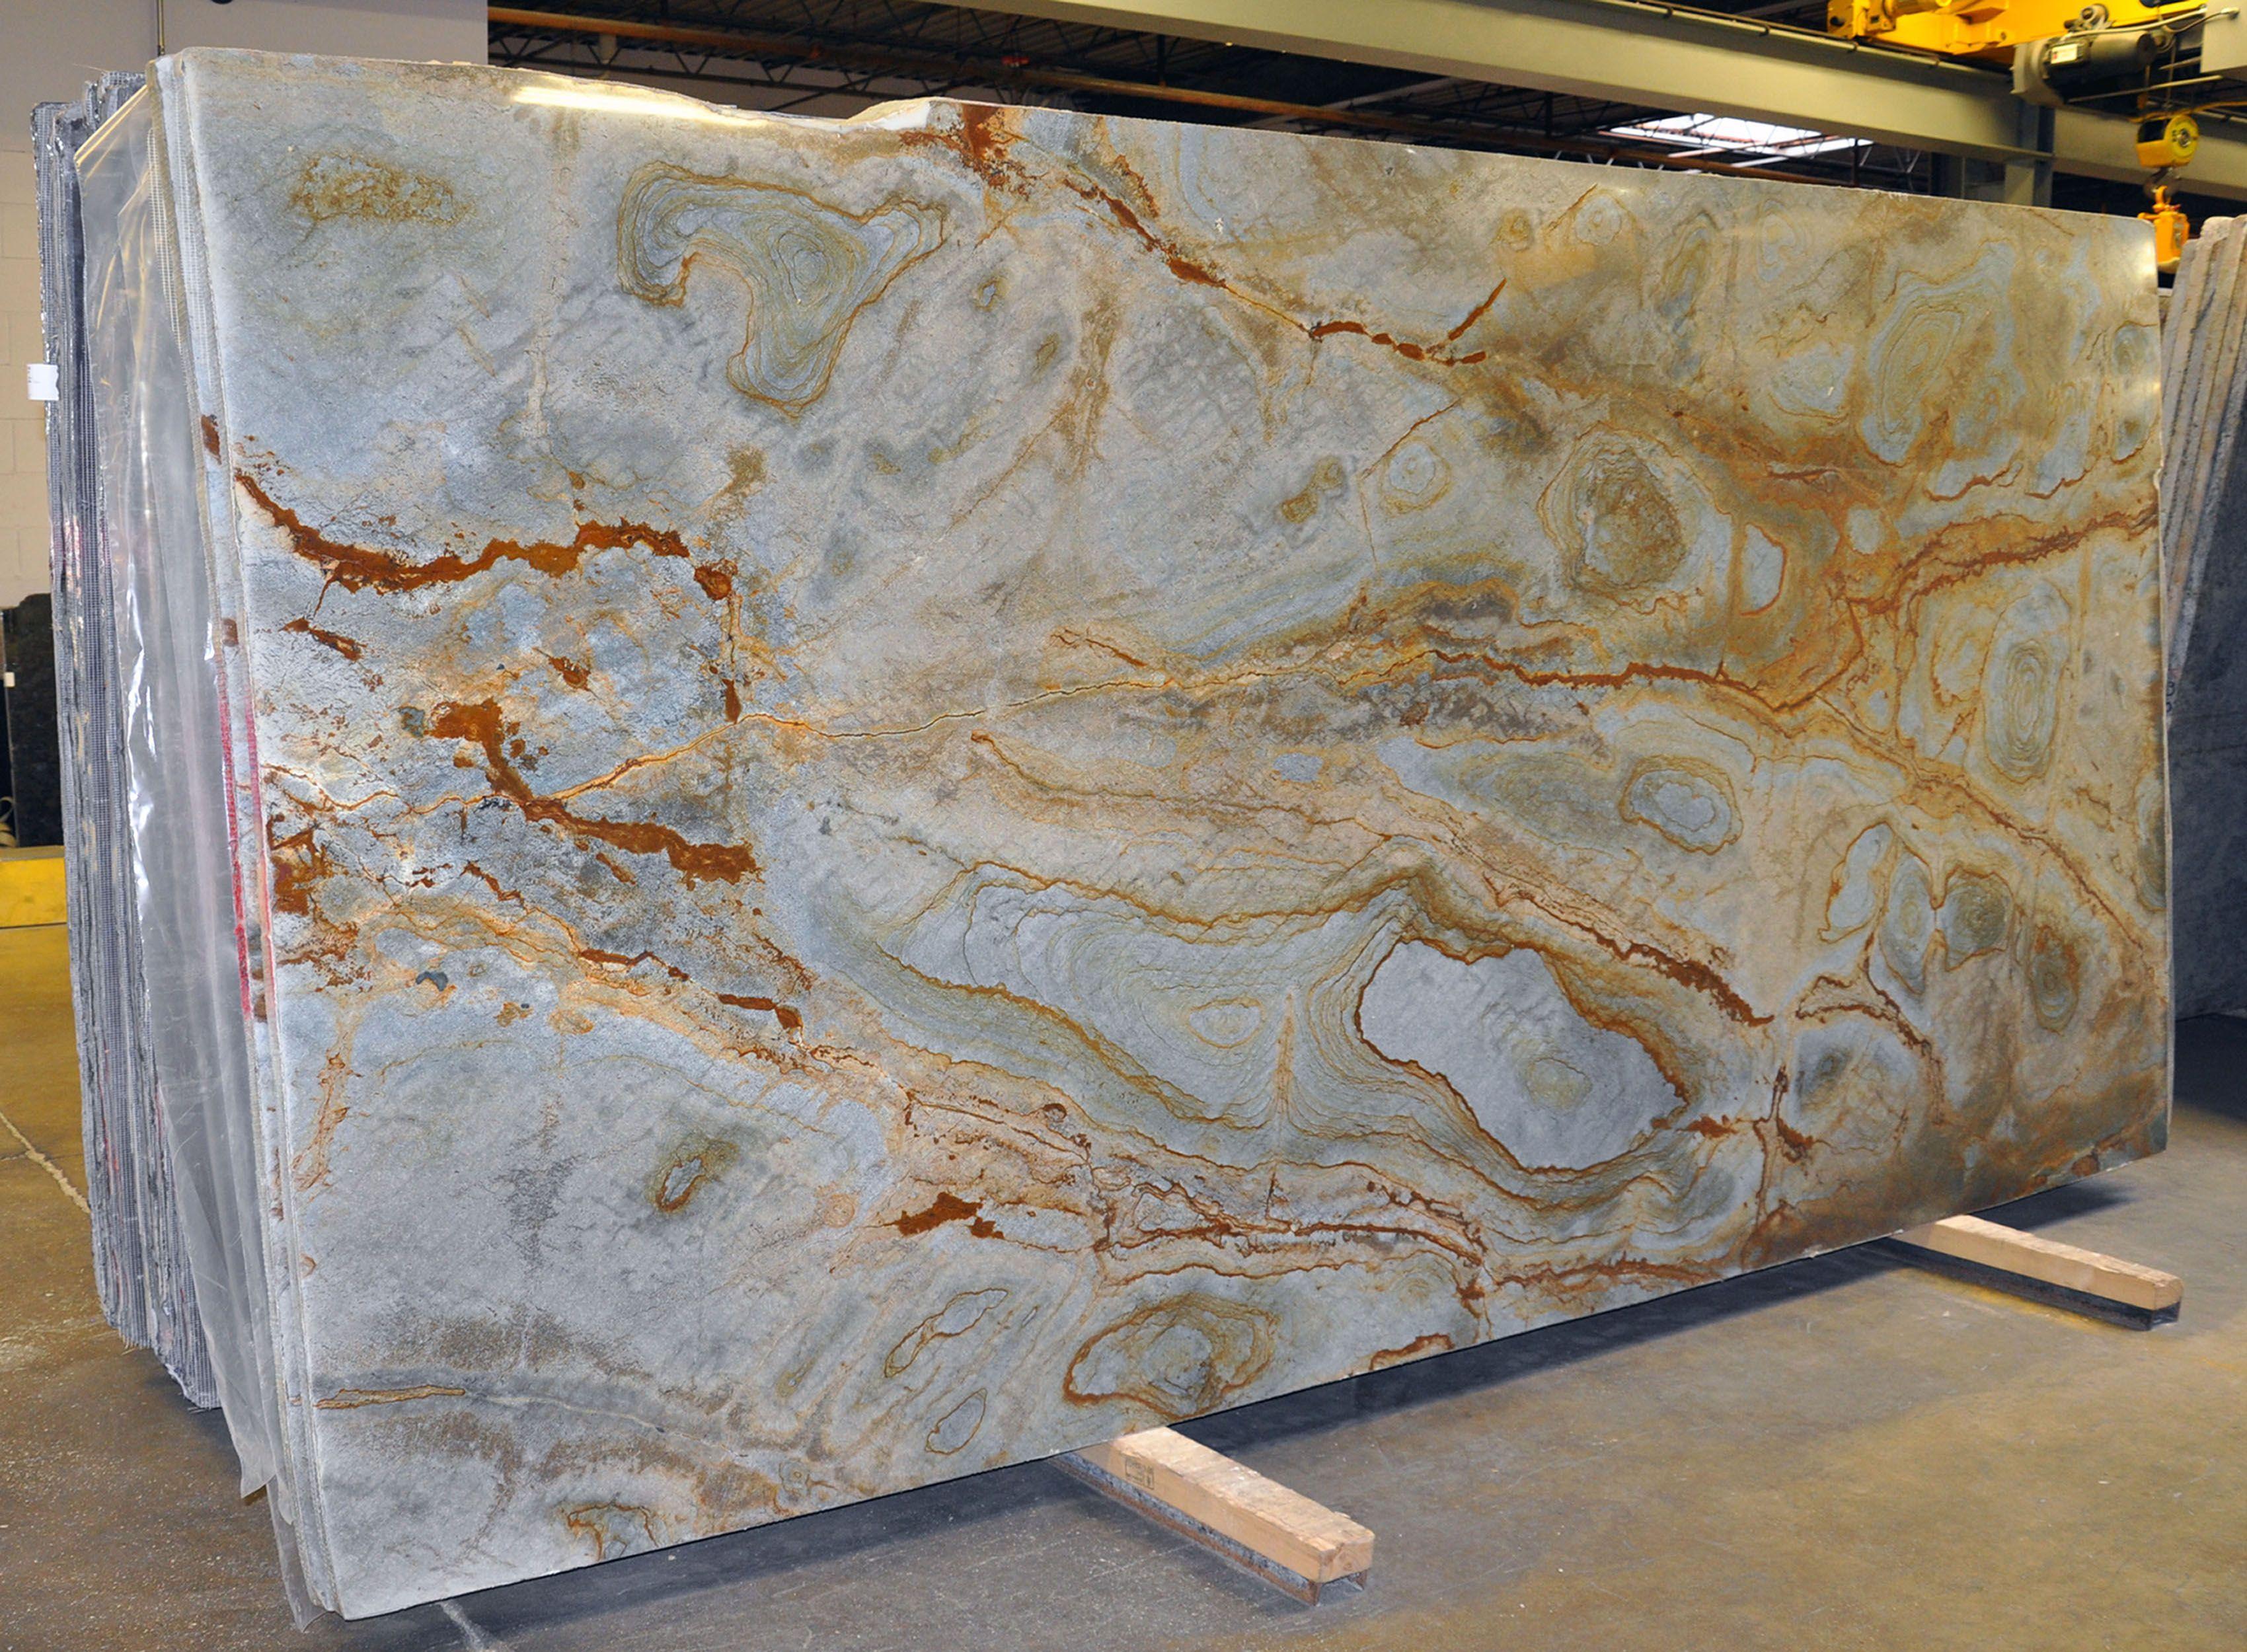 Blue mare granite - MGSI - Marble & Granite Supply of